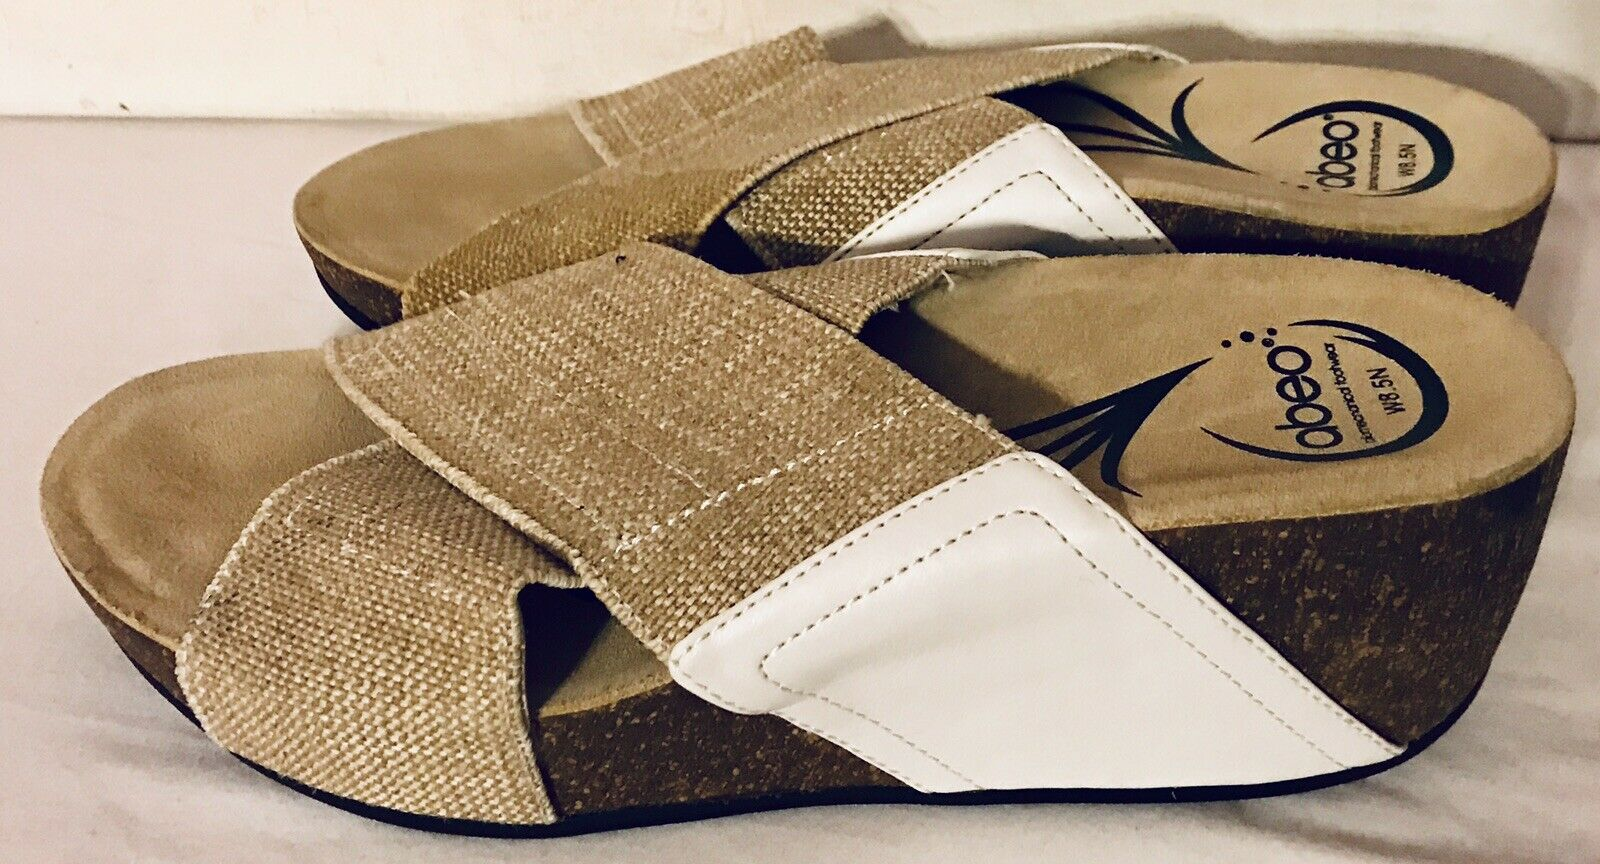 ABEO Unity Slip On Credver Wedge Sandal Stretch White Beige Brown Size 8.5 N